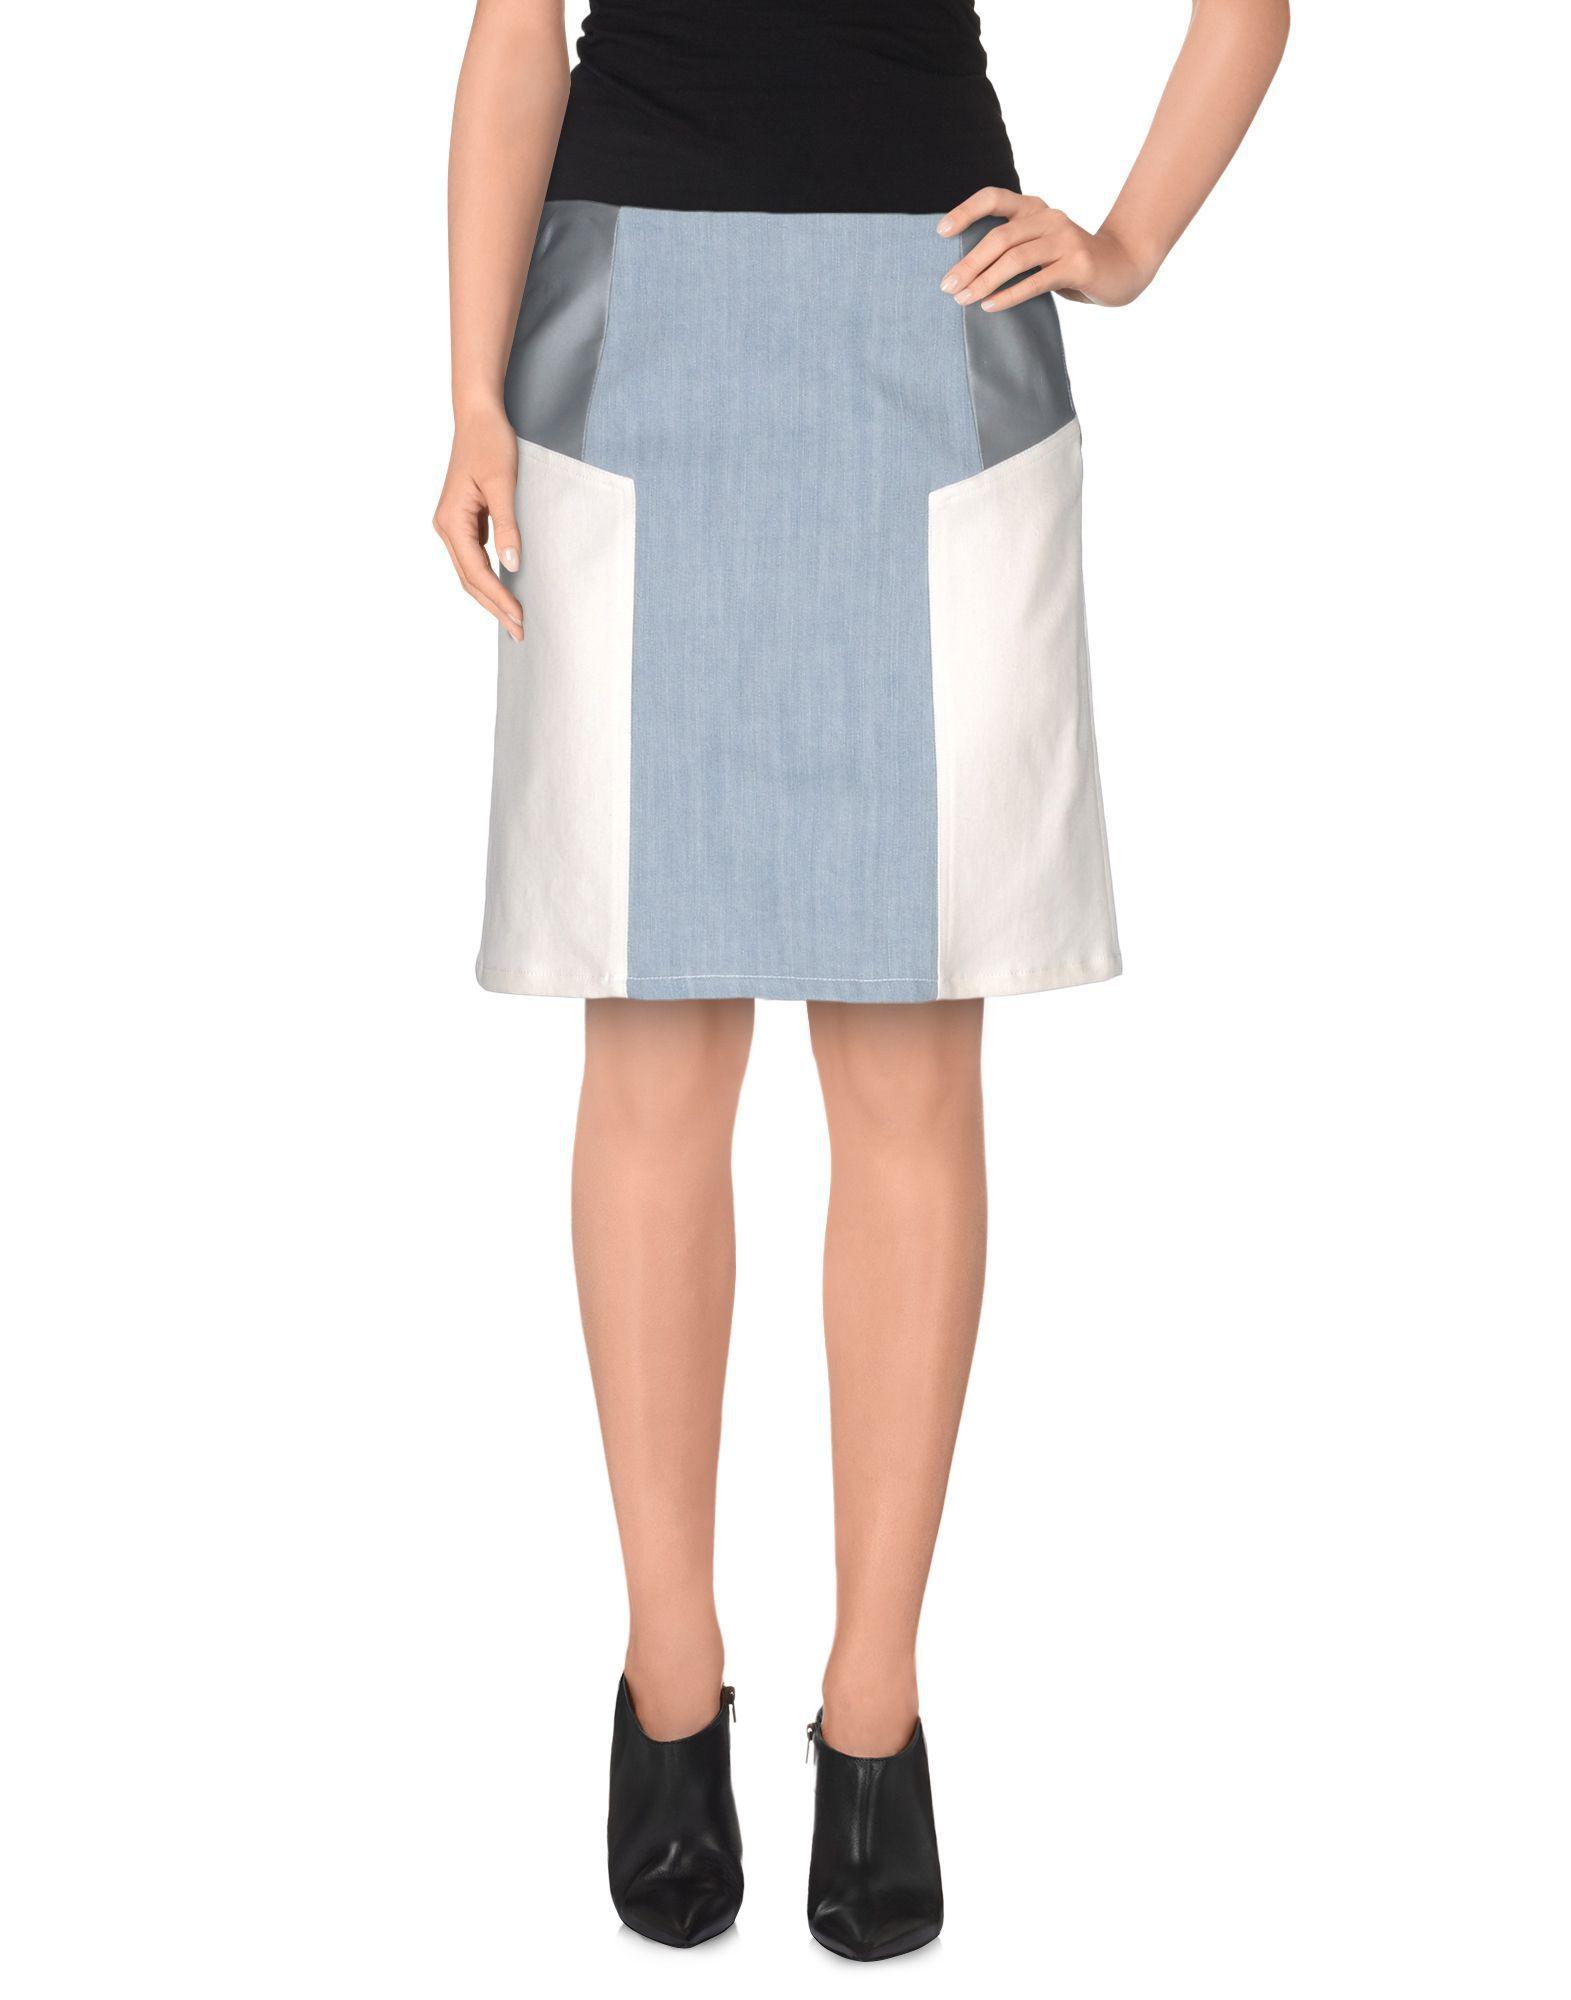 TRU TRUSSARDI DENIM Denim φούστα  #sales #style #fashion